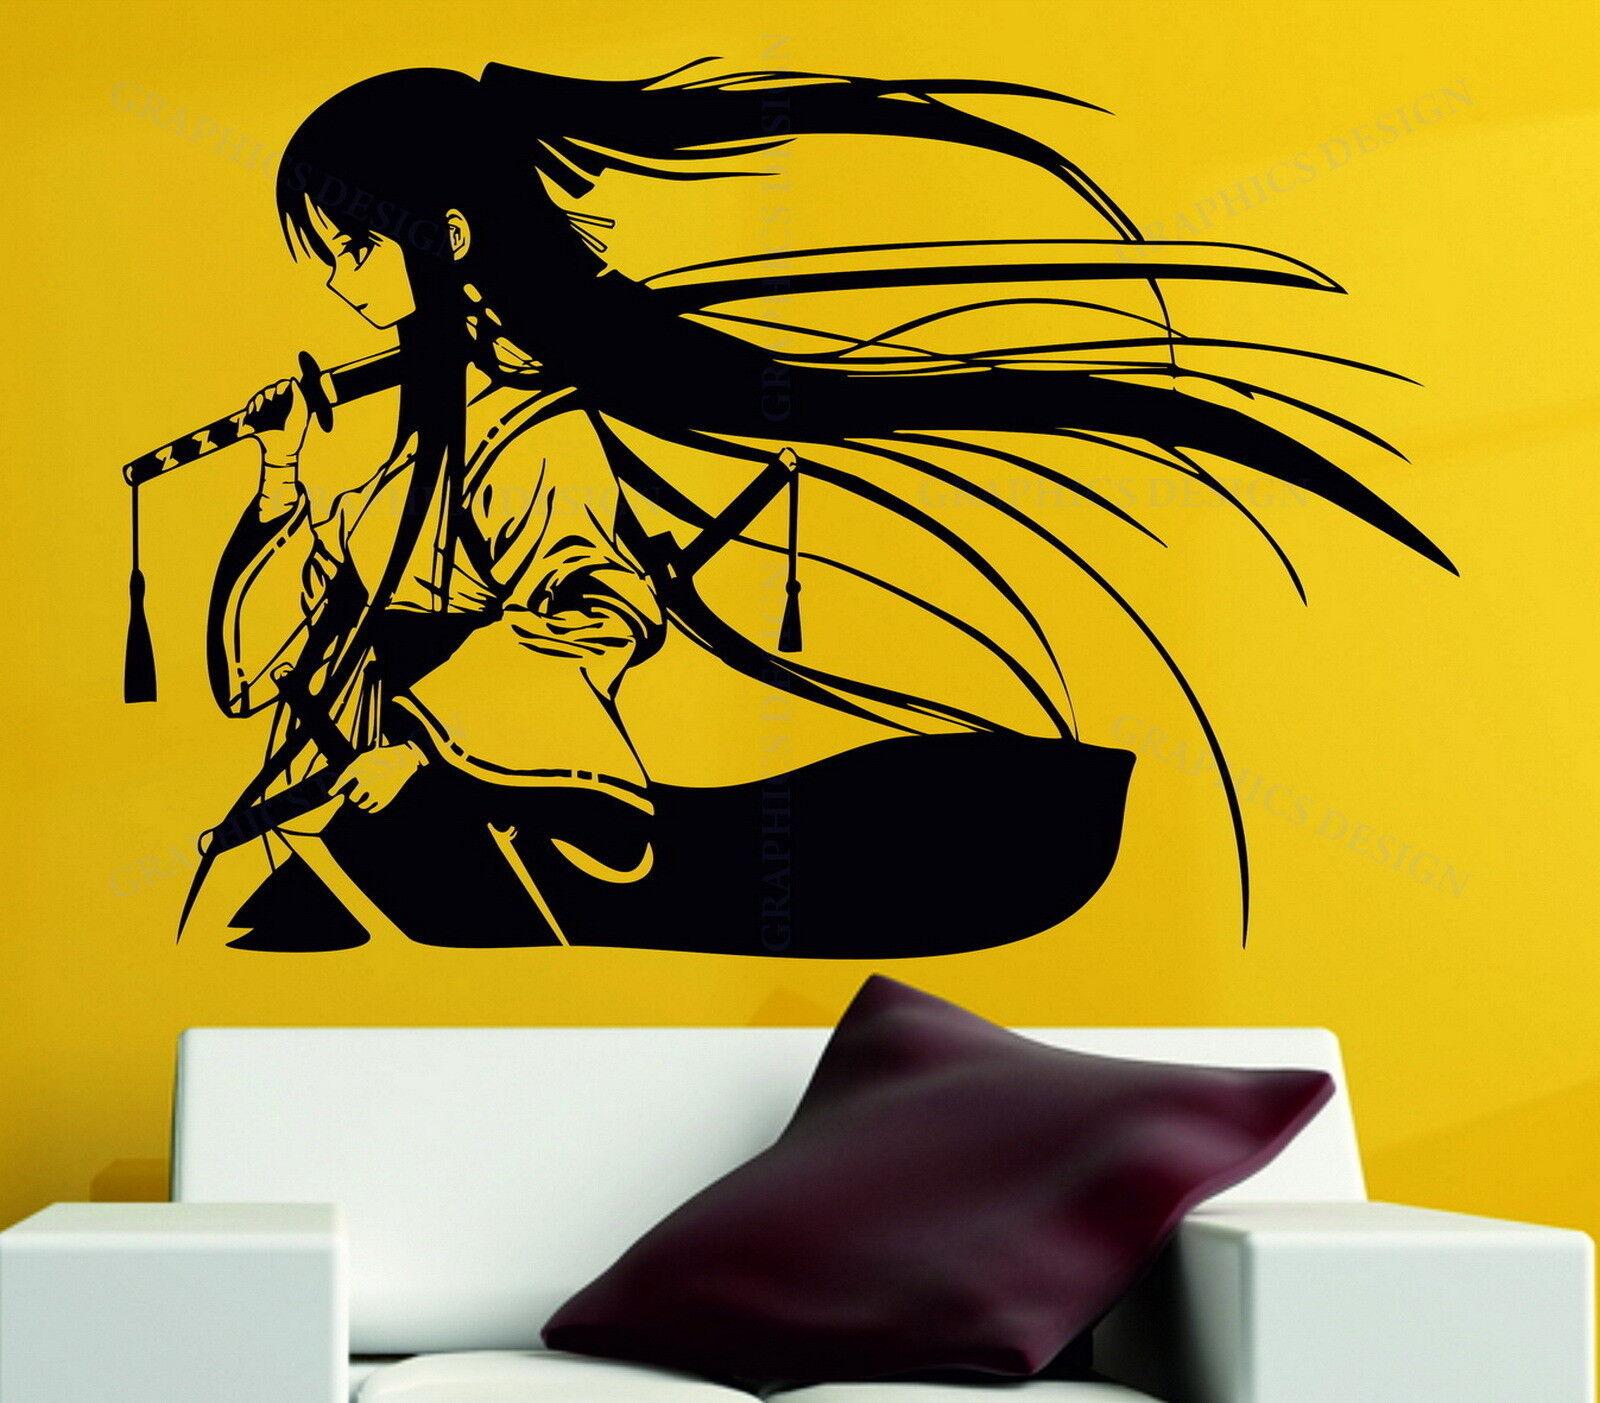 Samurai Geisha Japanese Katana Swords Anime Decorative Vinyl Wall ...